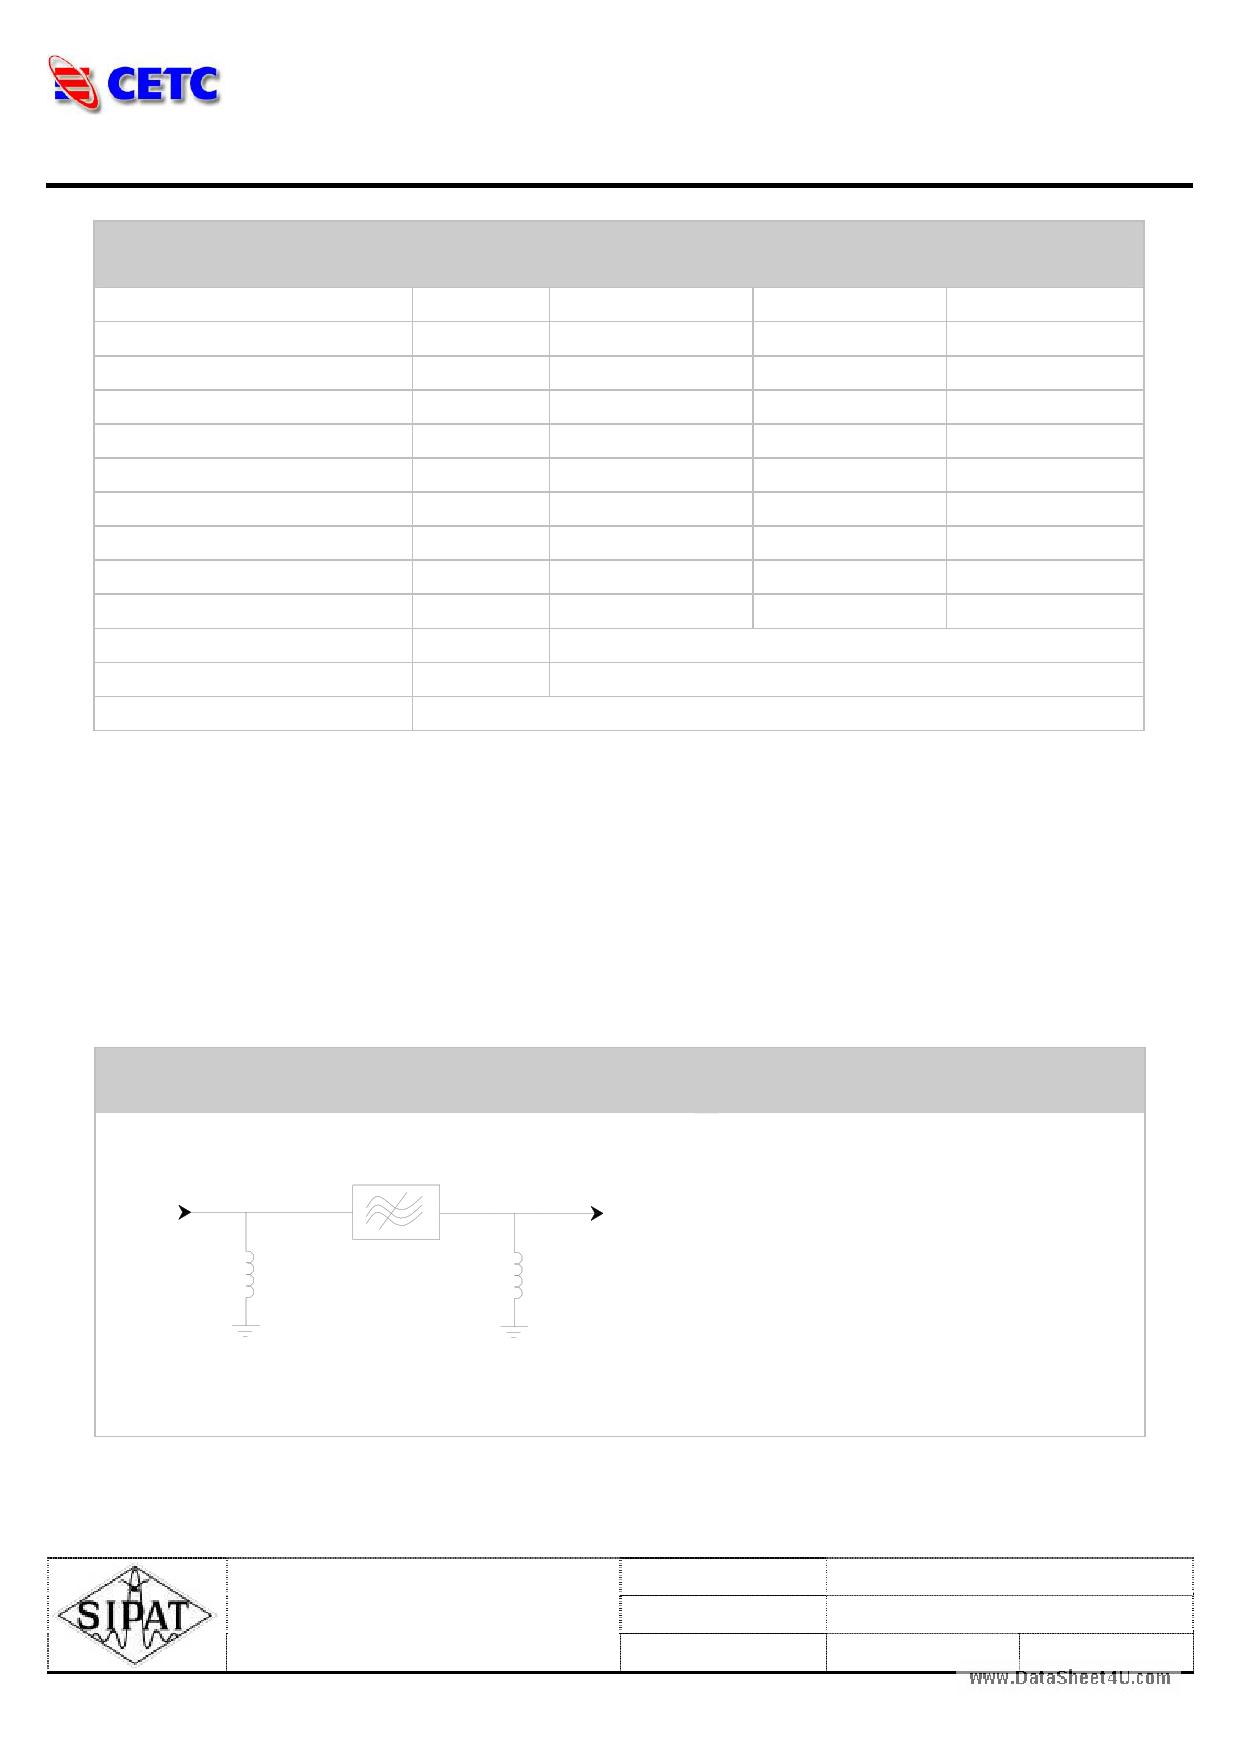 LBT16038 datasheet